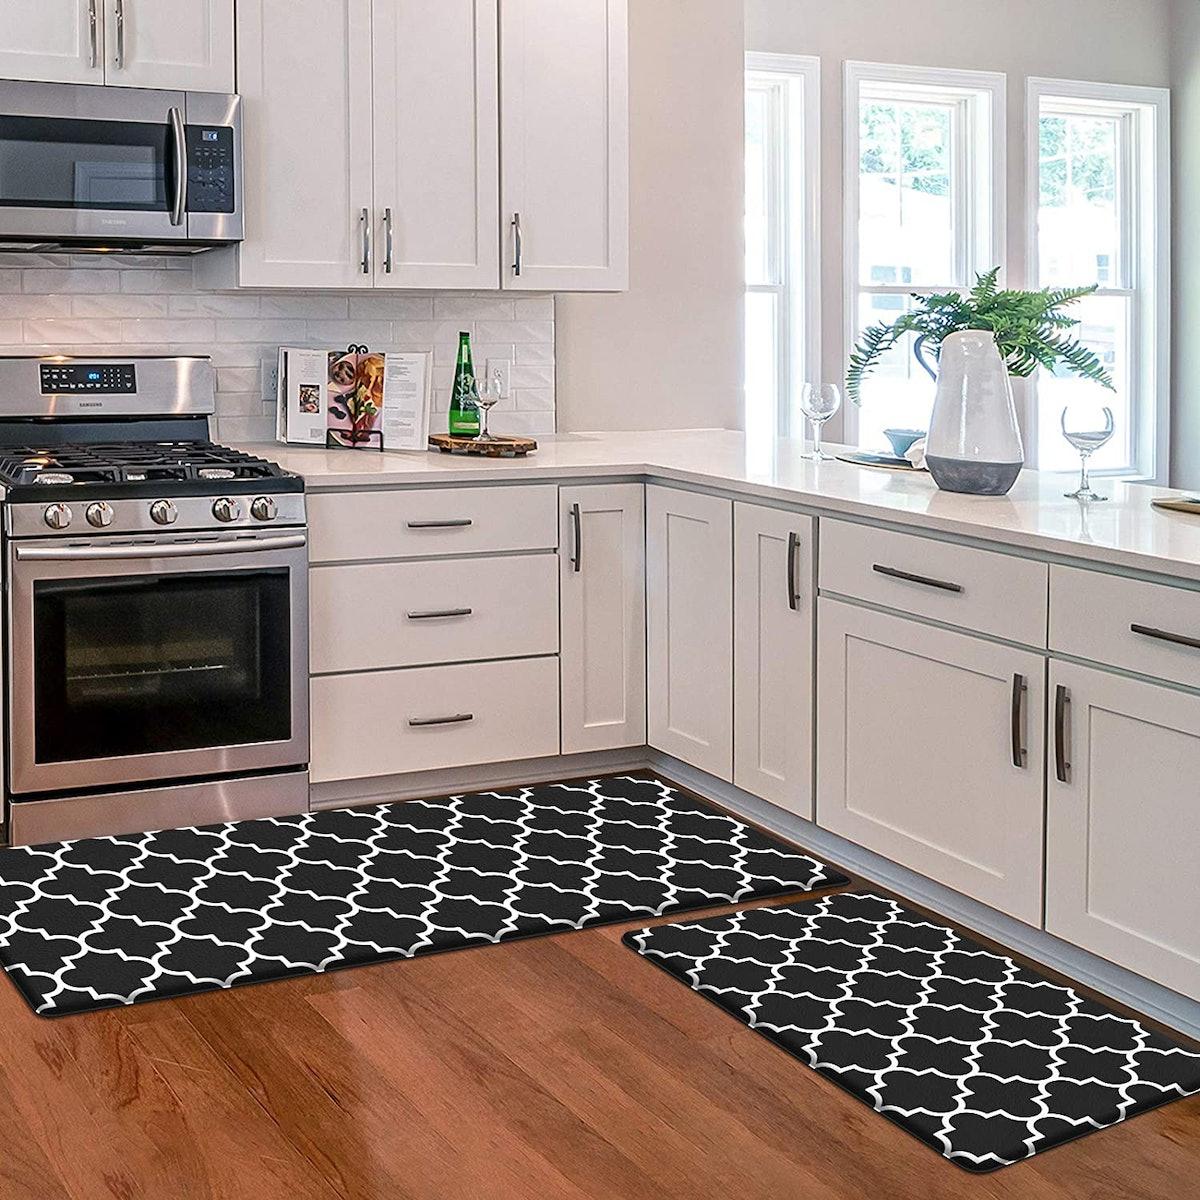 KMAT Kitchen Mat Cushioned Anti-Fatigue Floor Mat (2 Pieces)